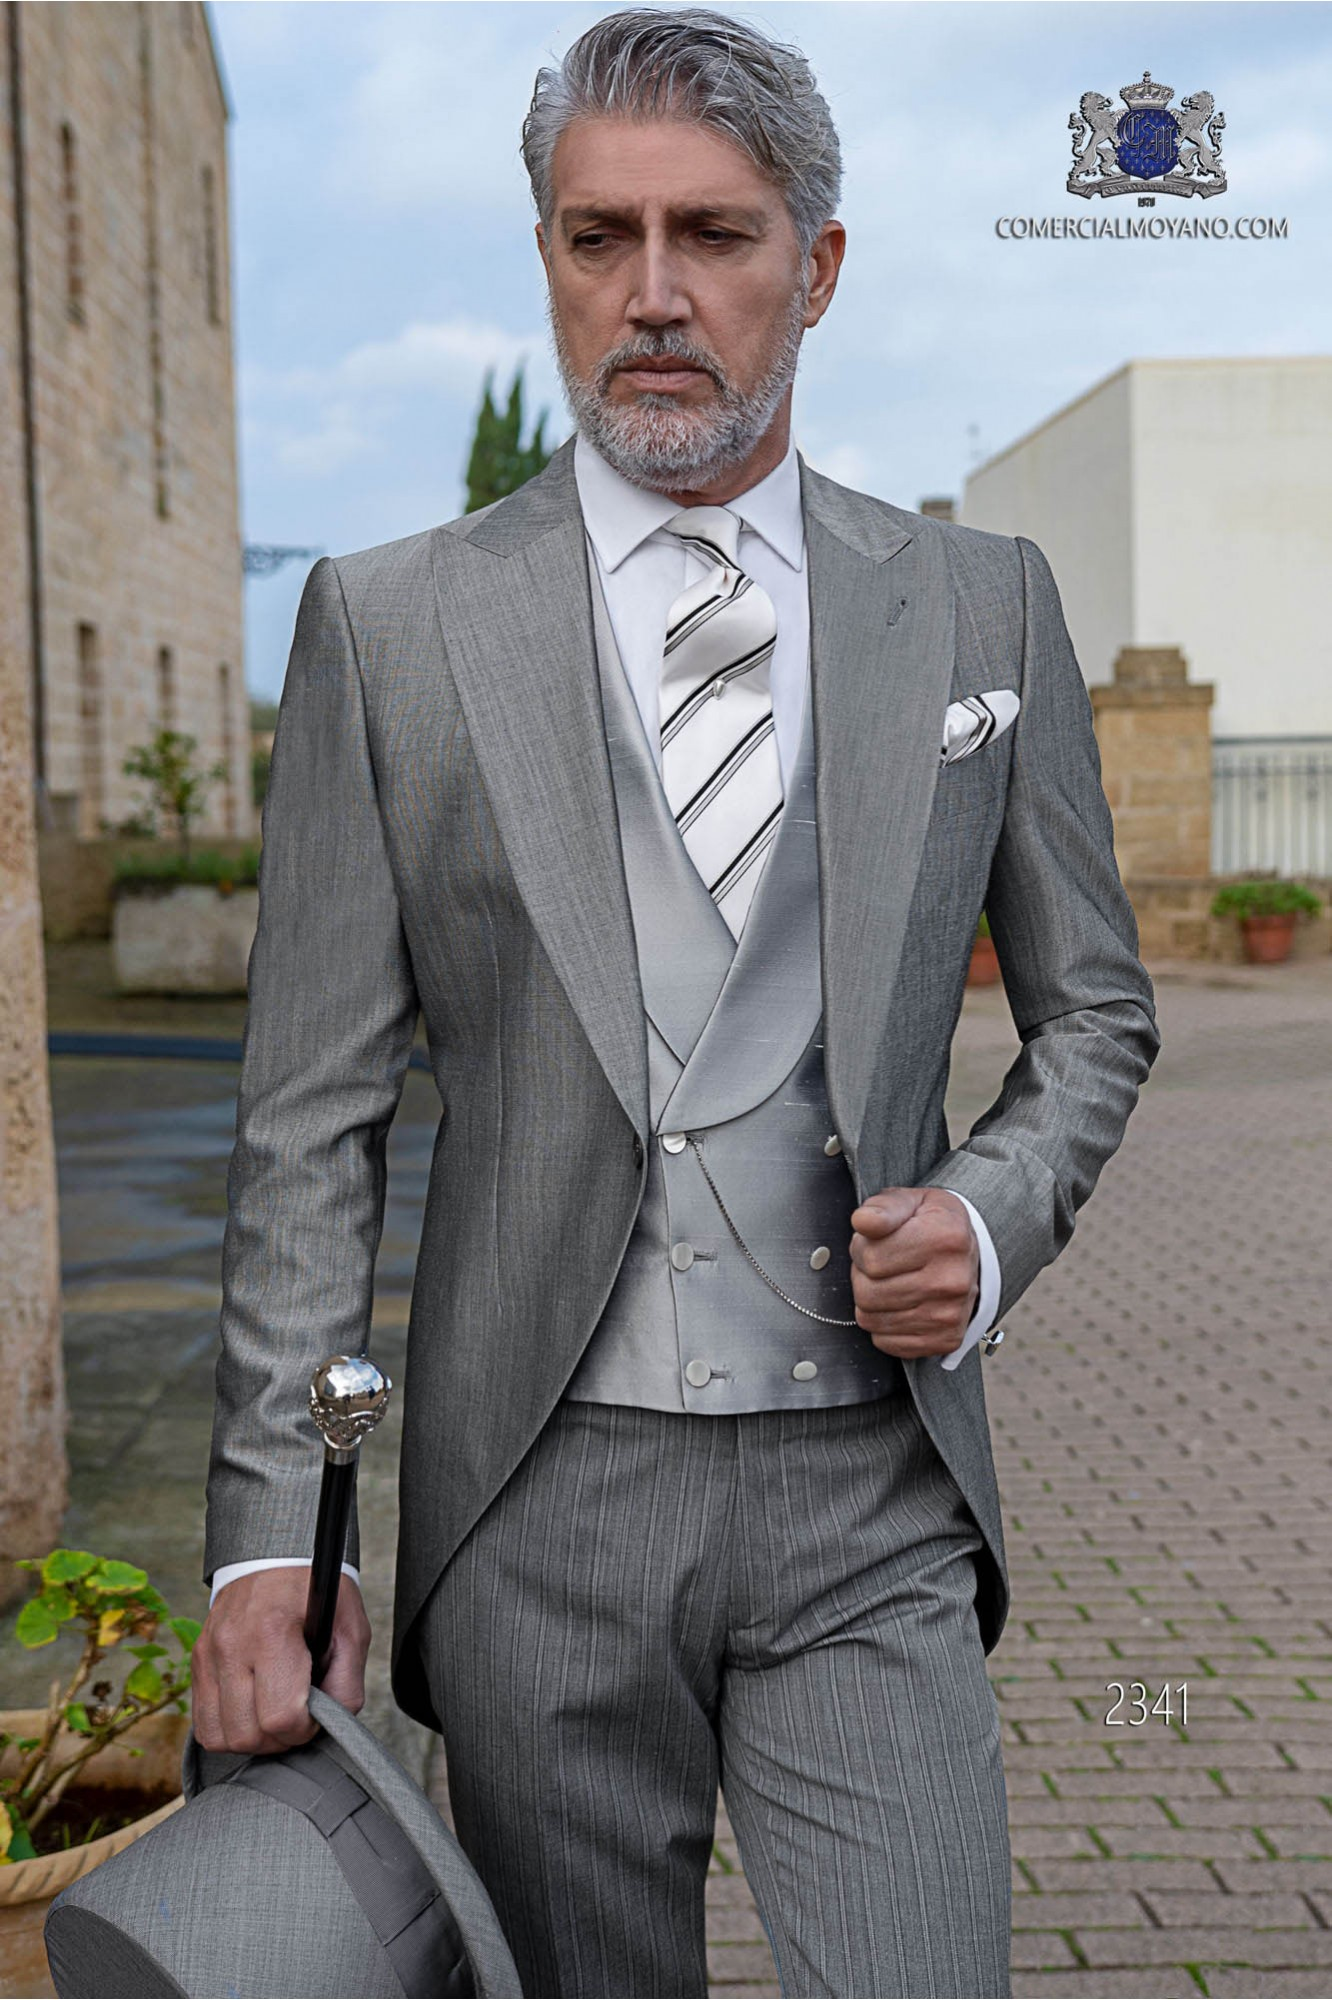 Italian bespoke morning suit mohair wool mix alpaca light grey with pinstripe trousers